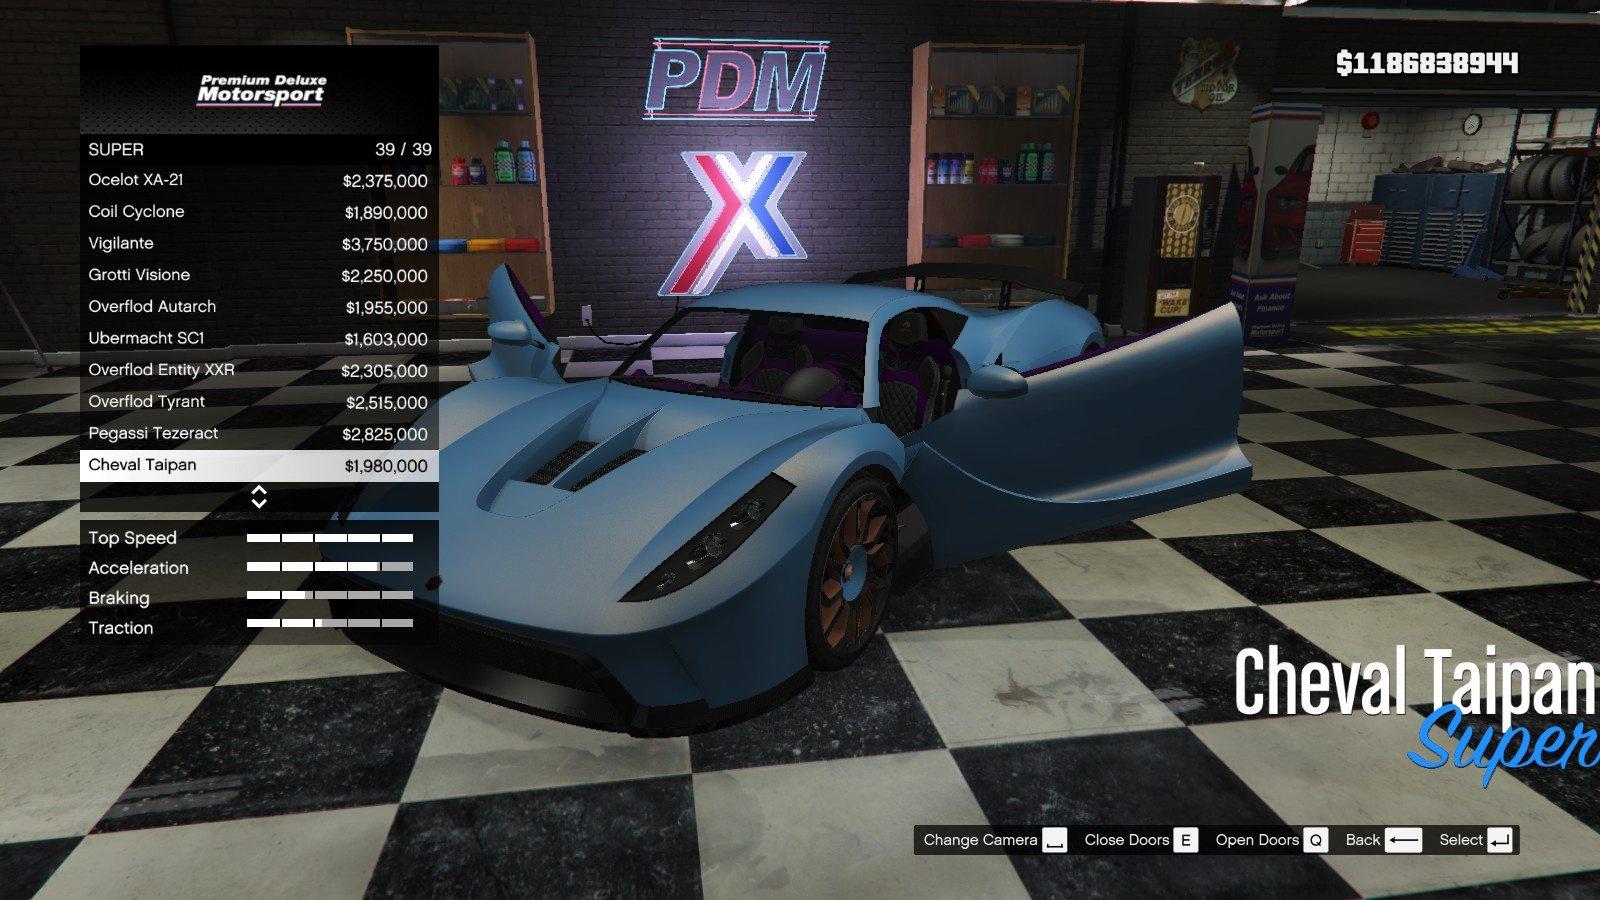 Premium Deluxe Motorsport Car Dealership - GTA5-Mods com